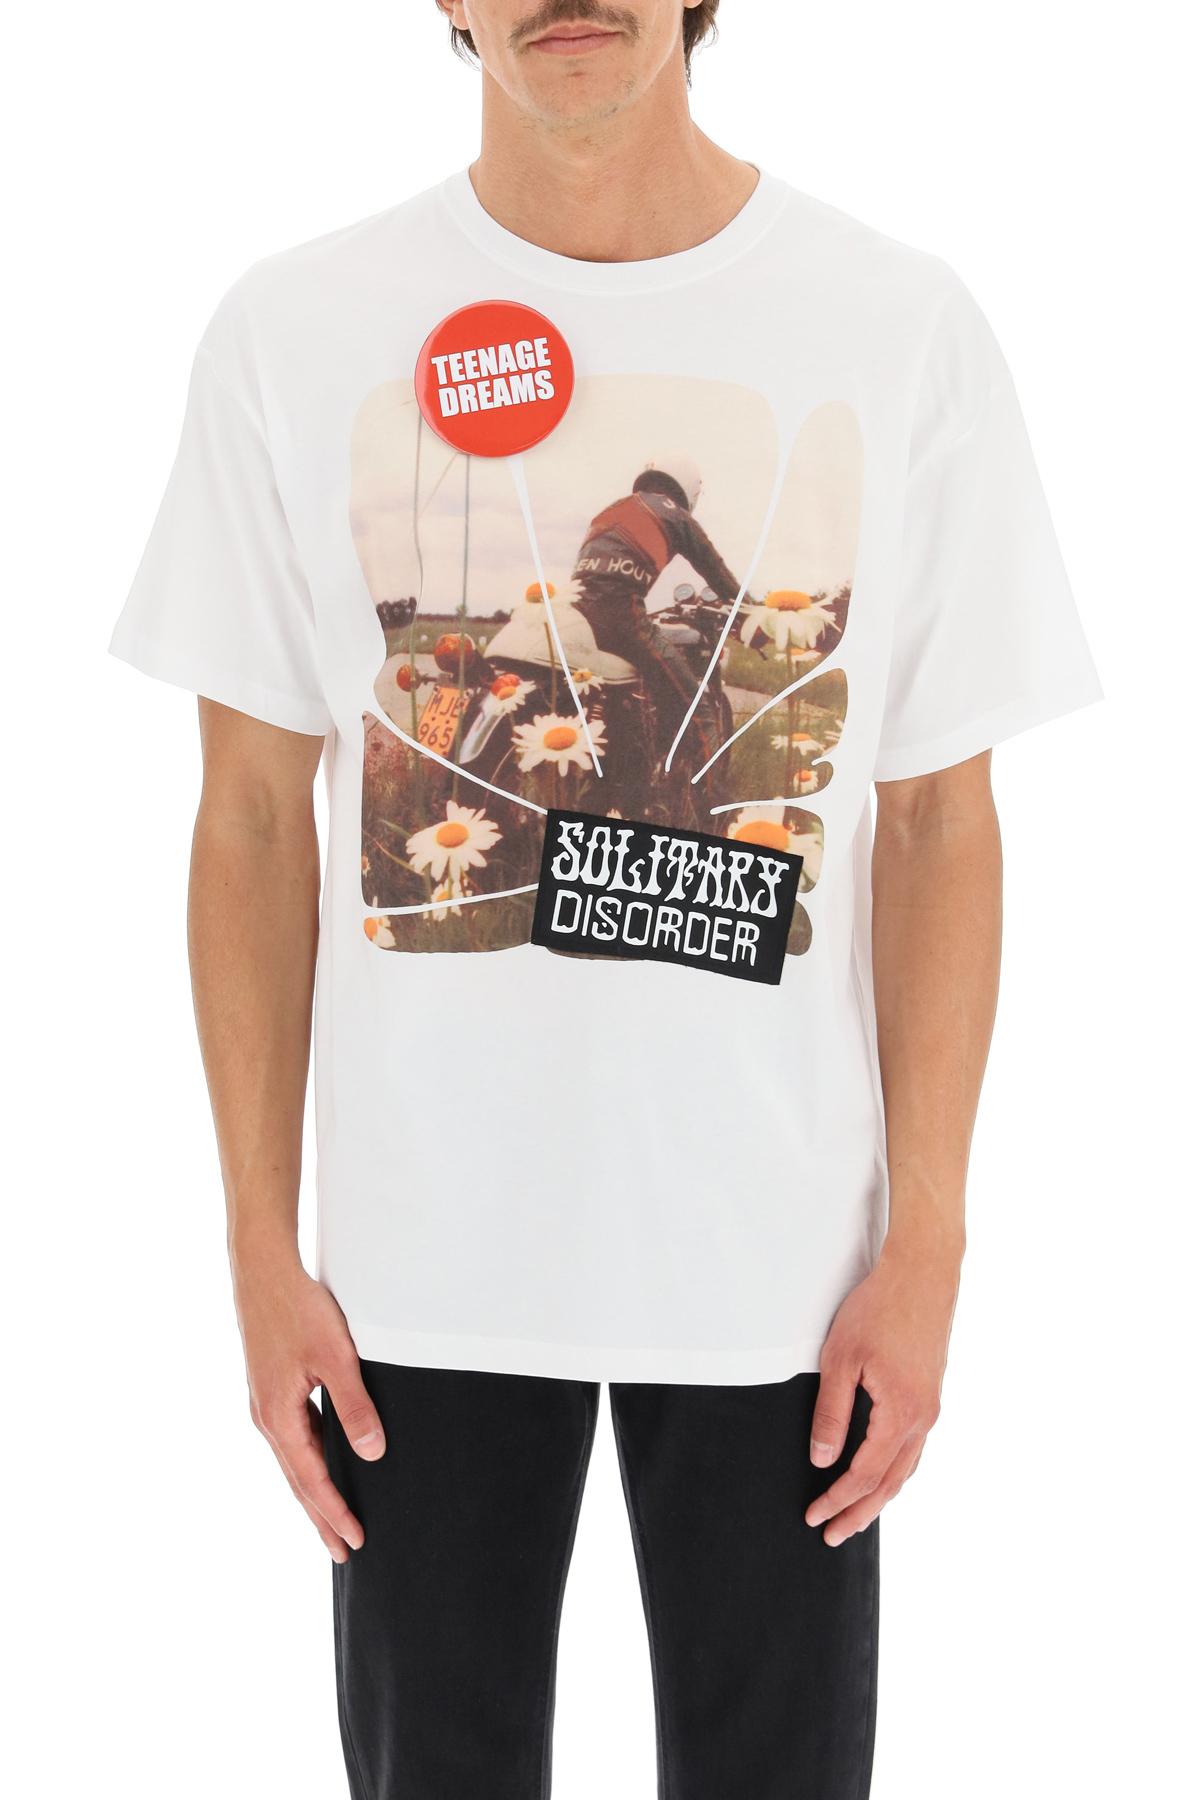 Raf simons t-shirt solitary disorder